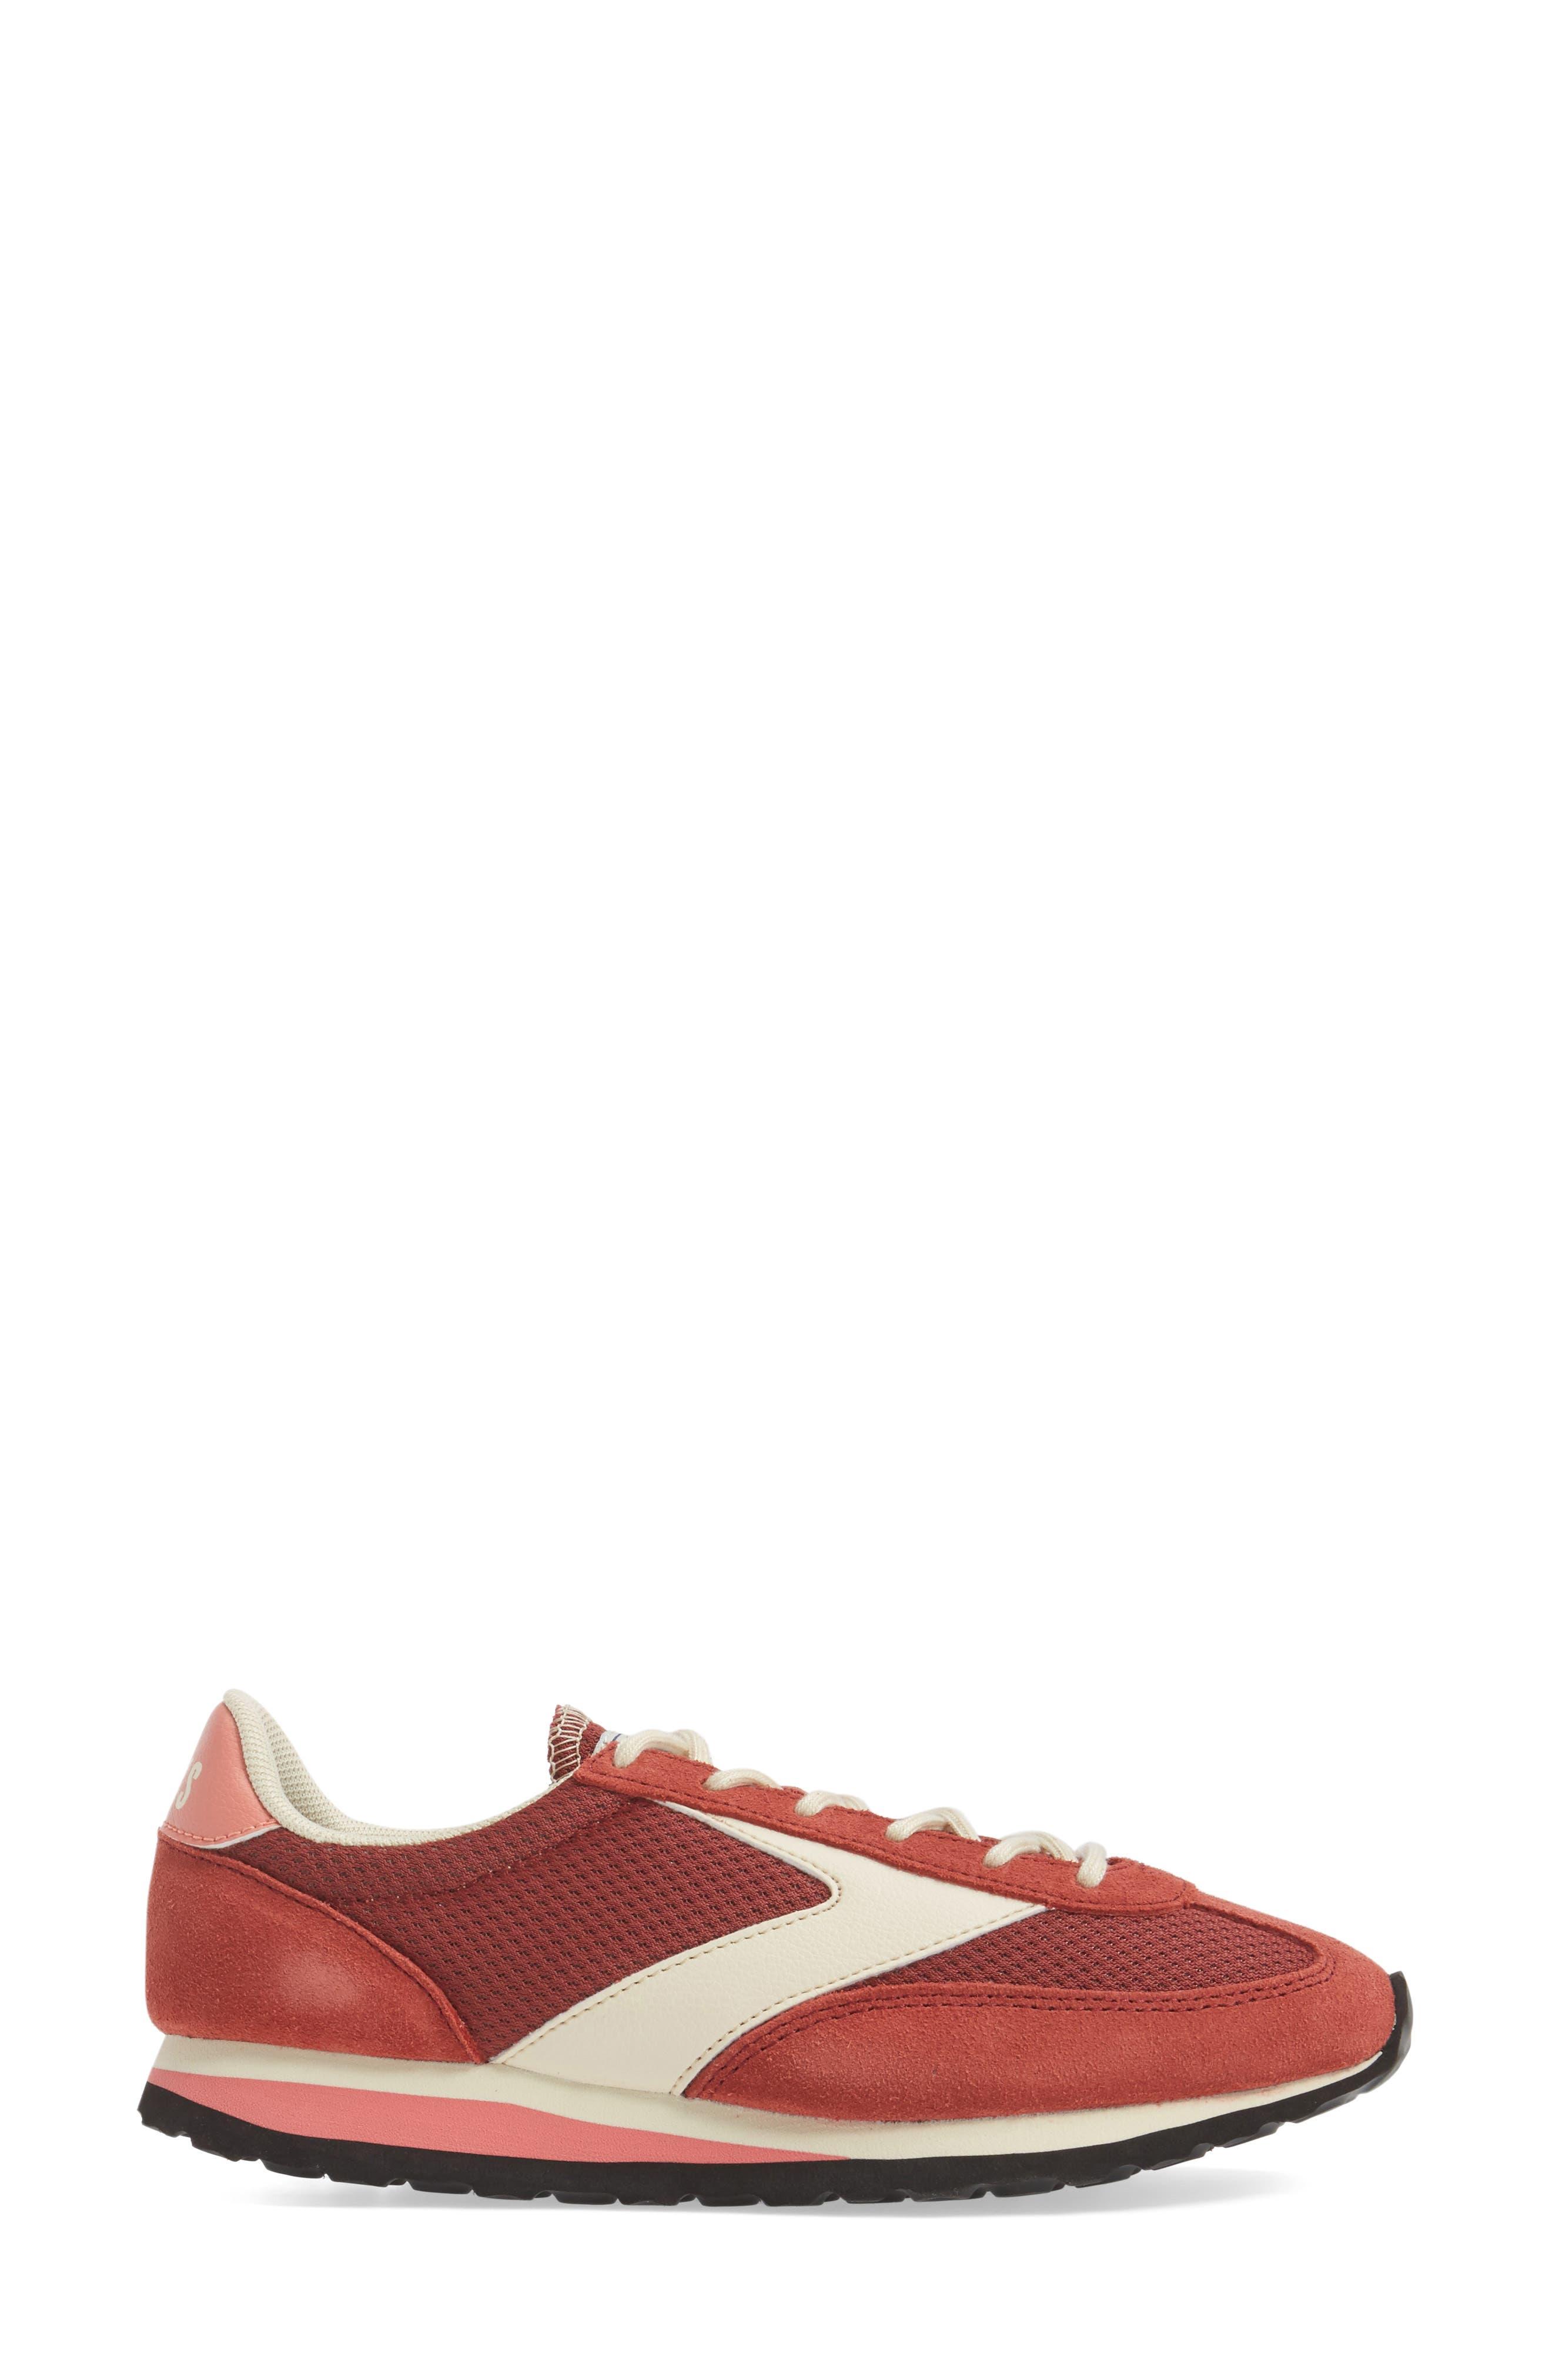 'Vanguard' Sneaker,                             Alternate thumbnail 133, color,